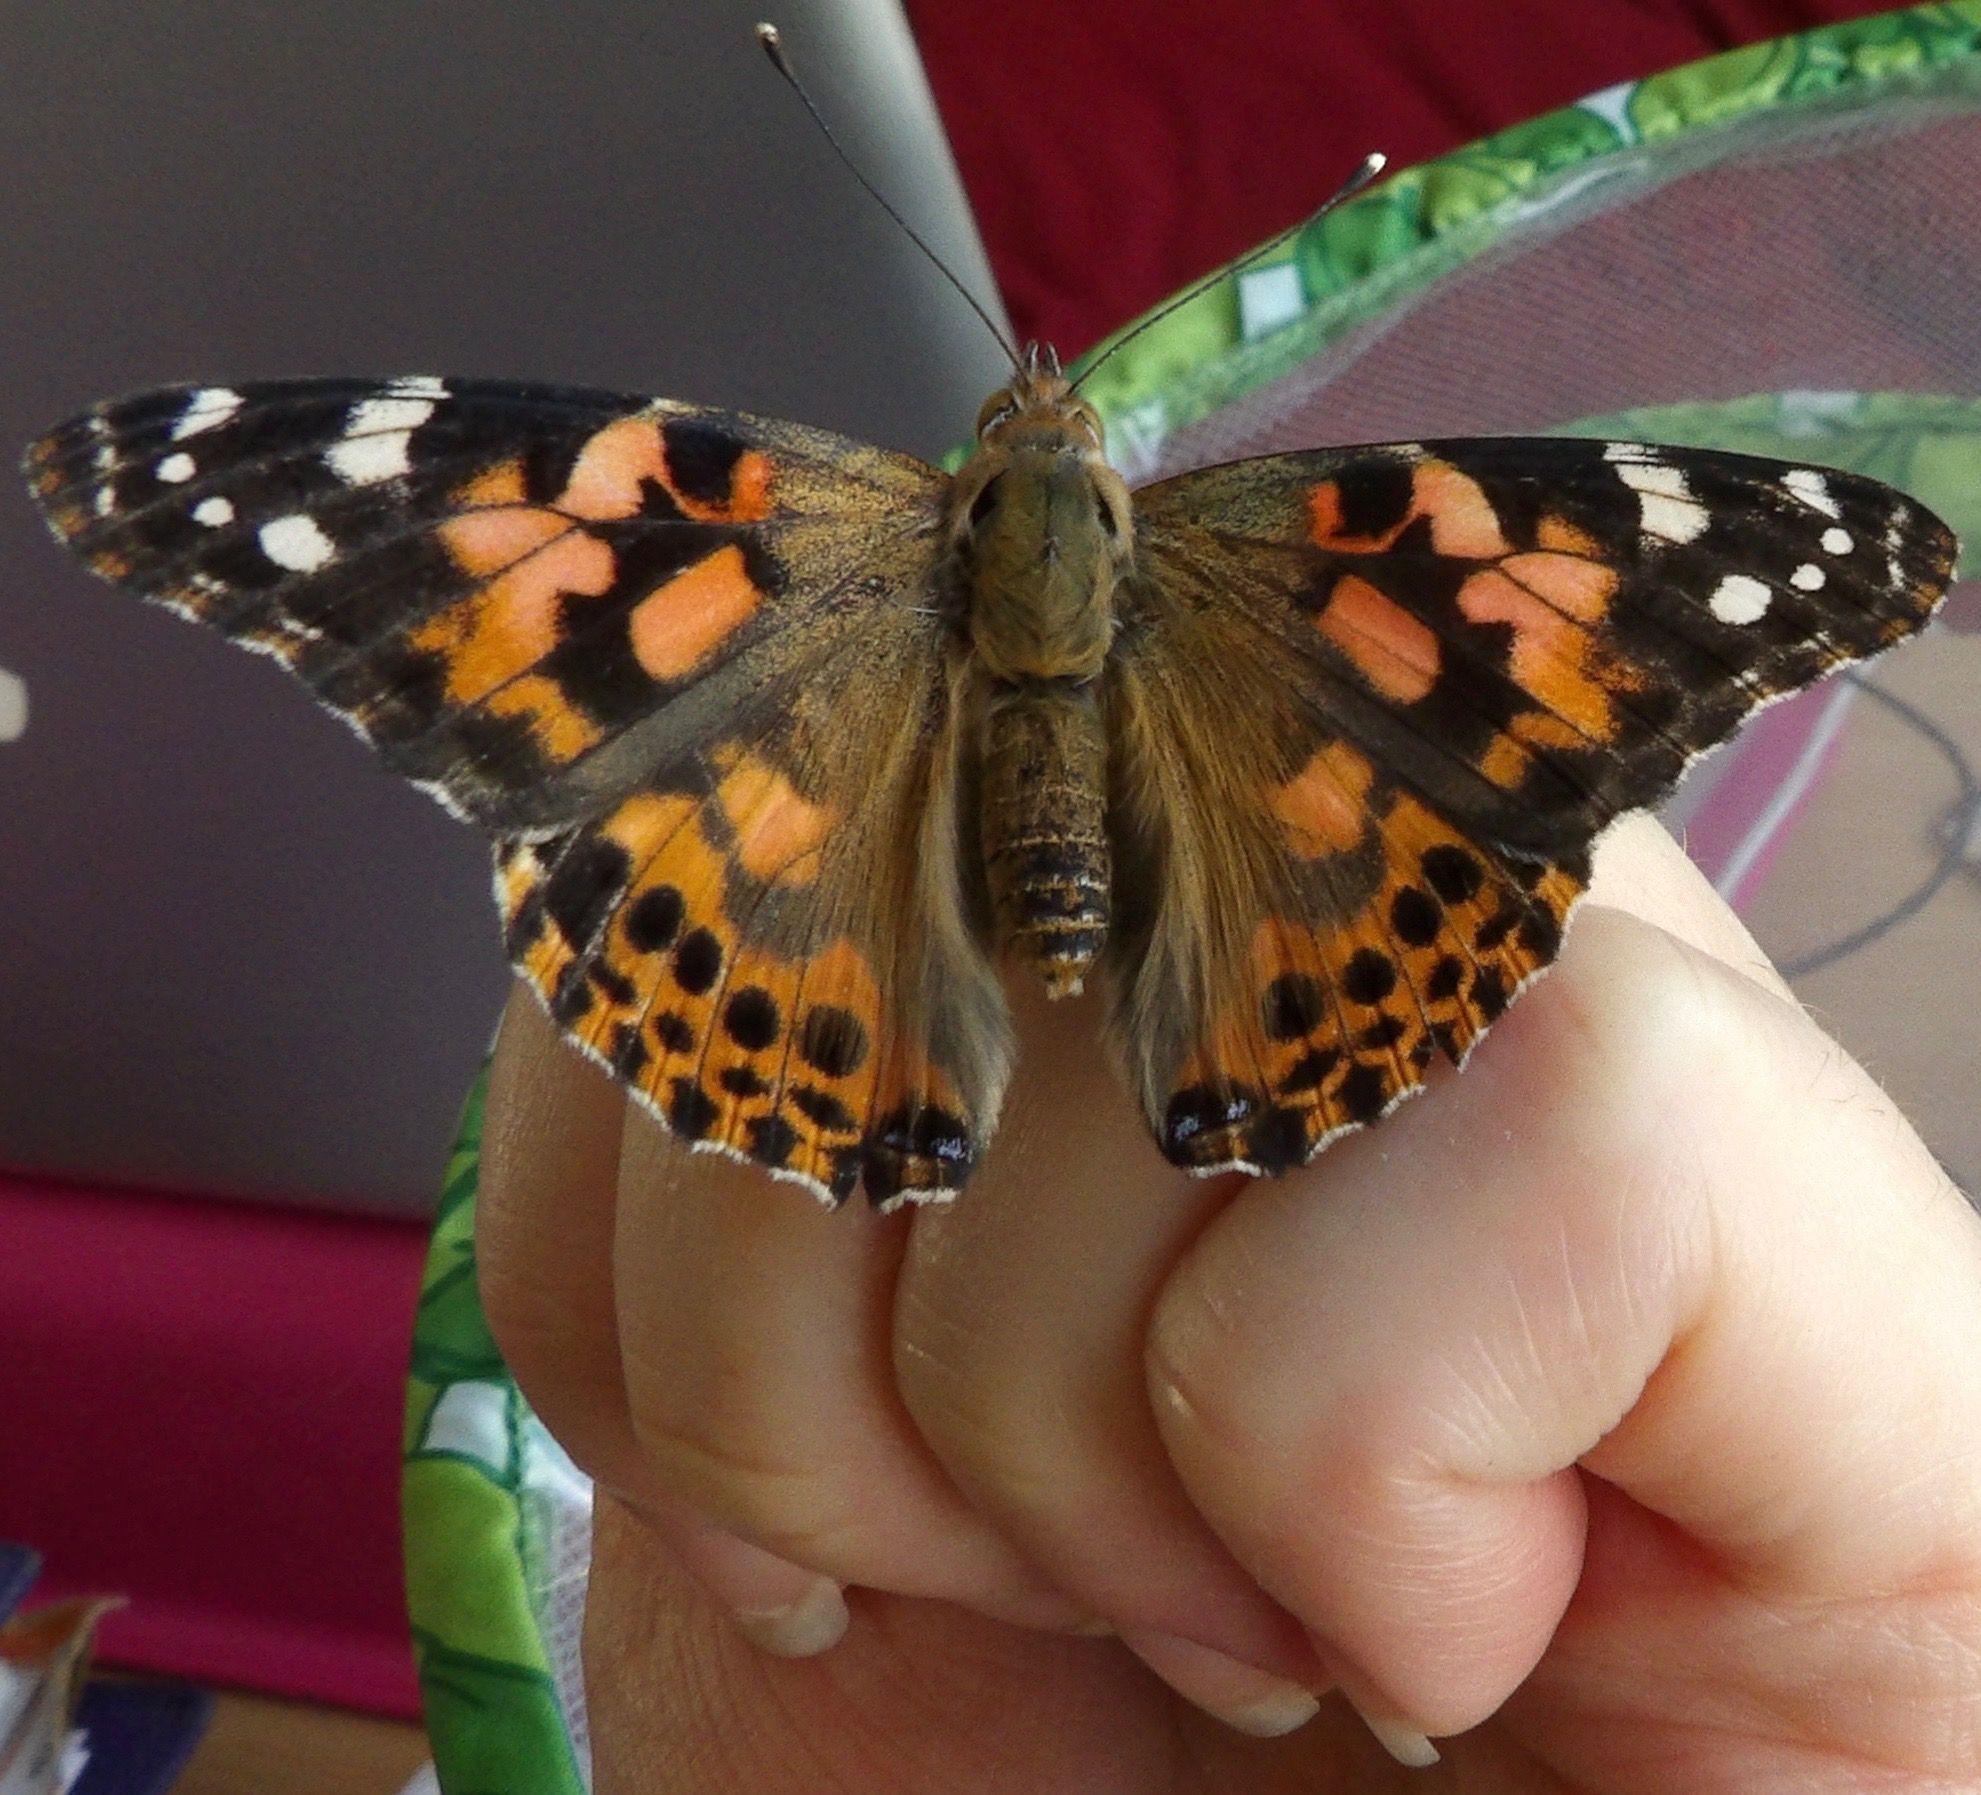 #PaintedLadyButterfly #WildLIfe #MiniBeast #Nature